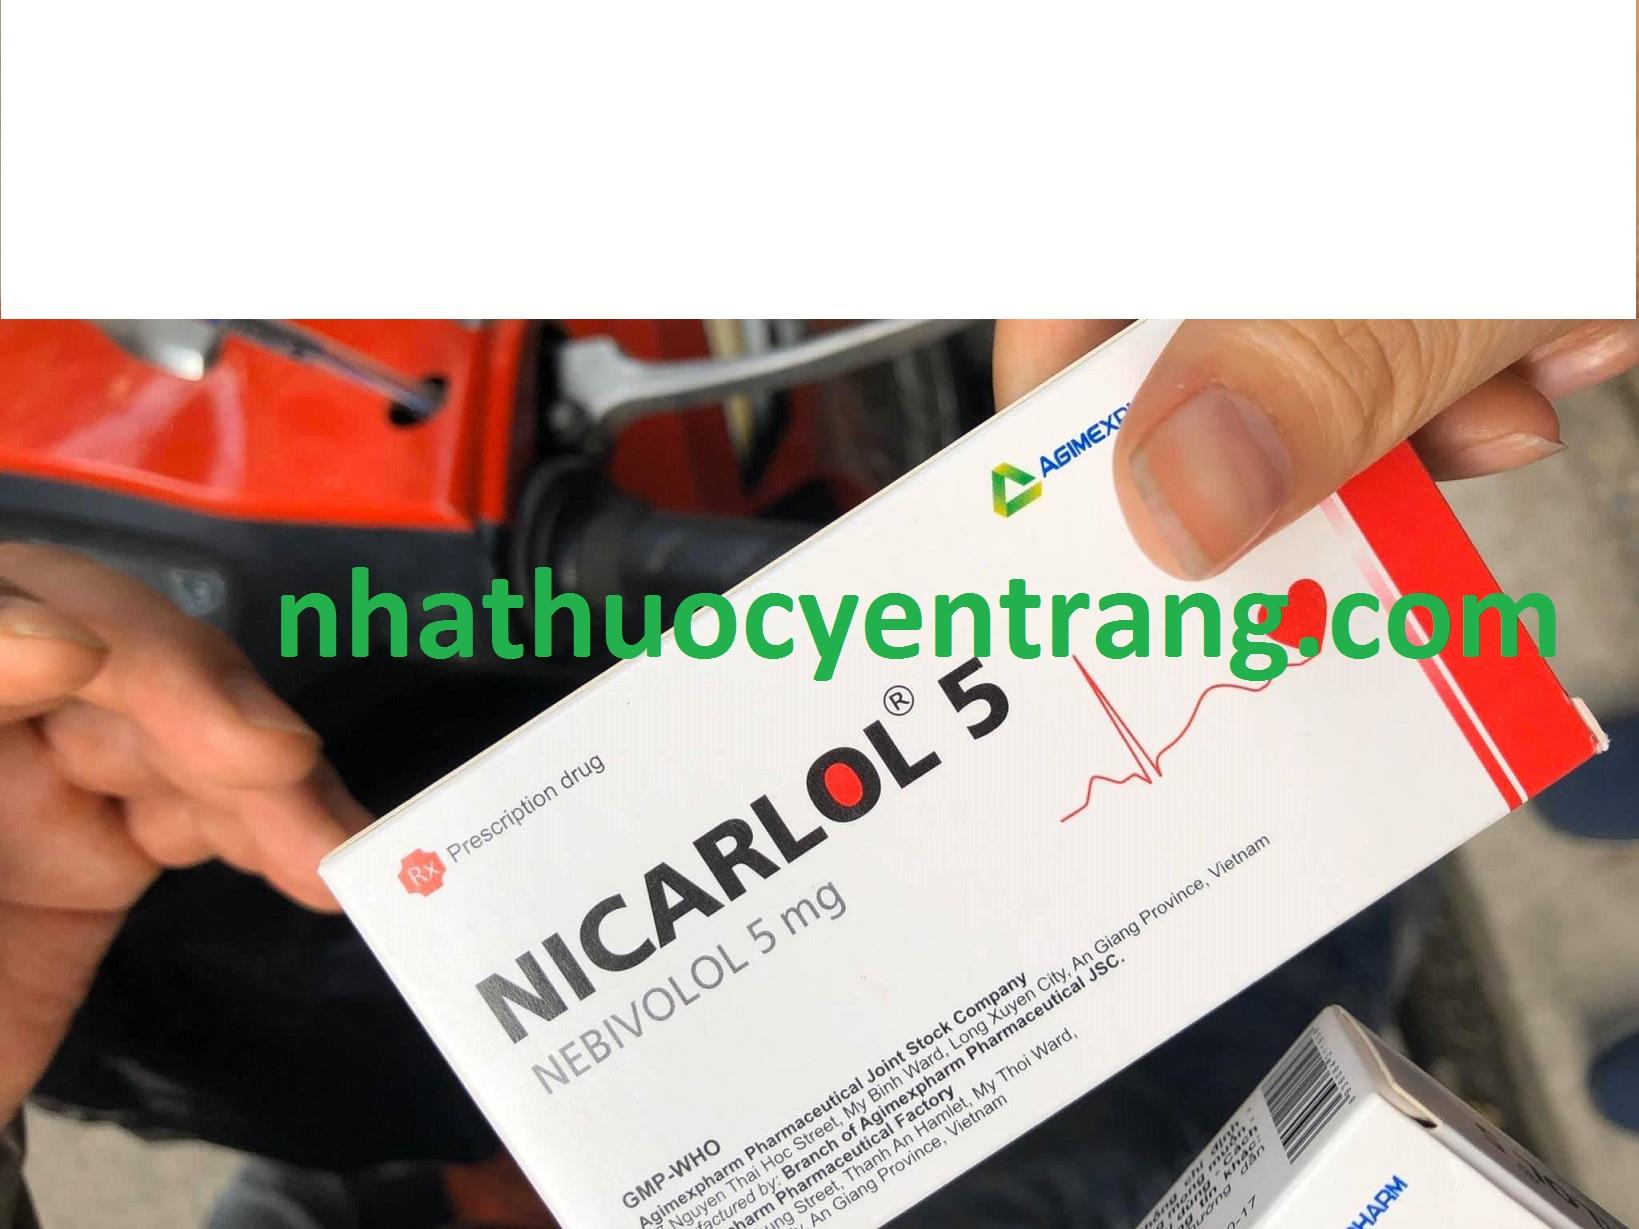 Nicarlol 5mg